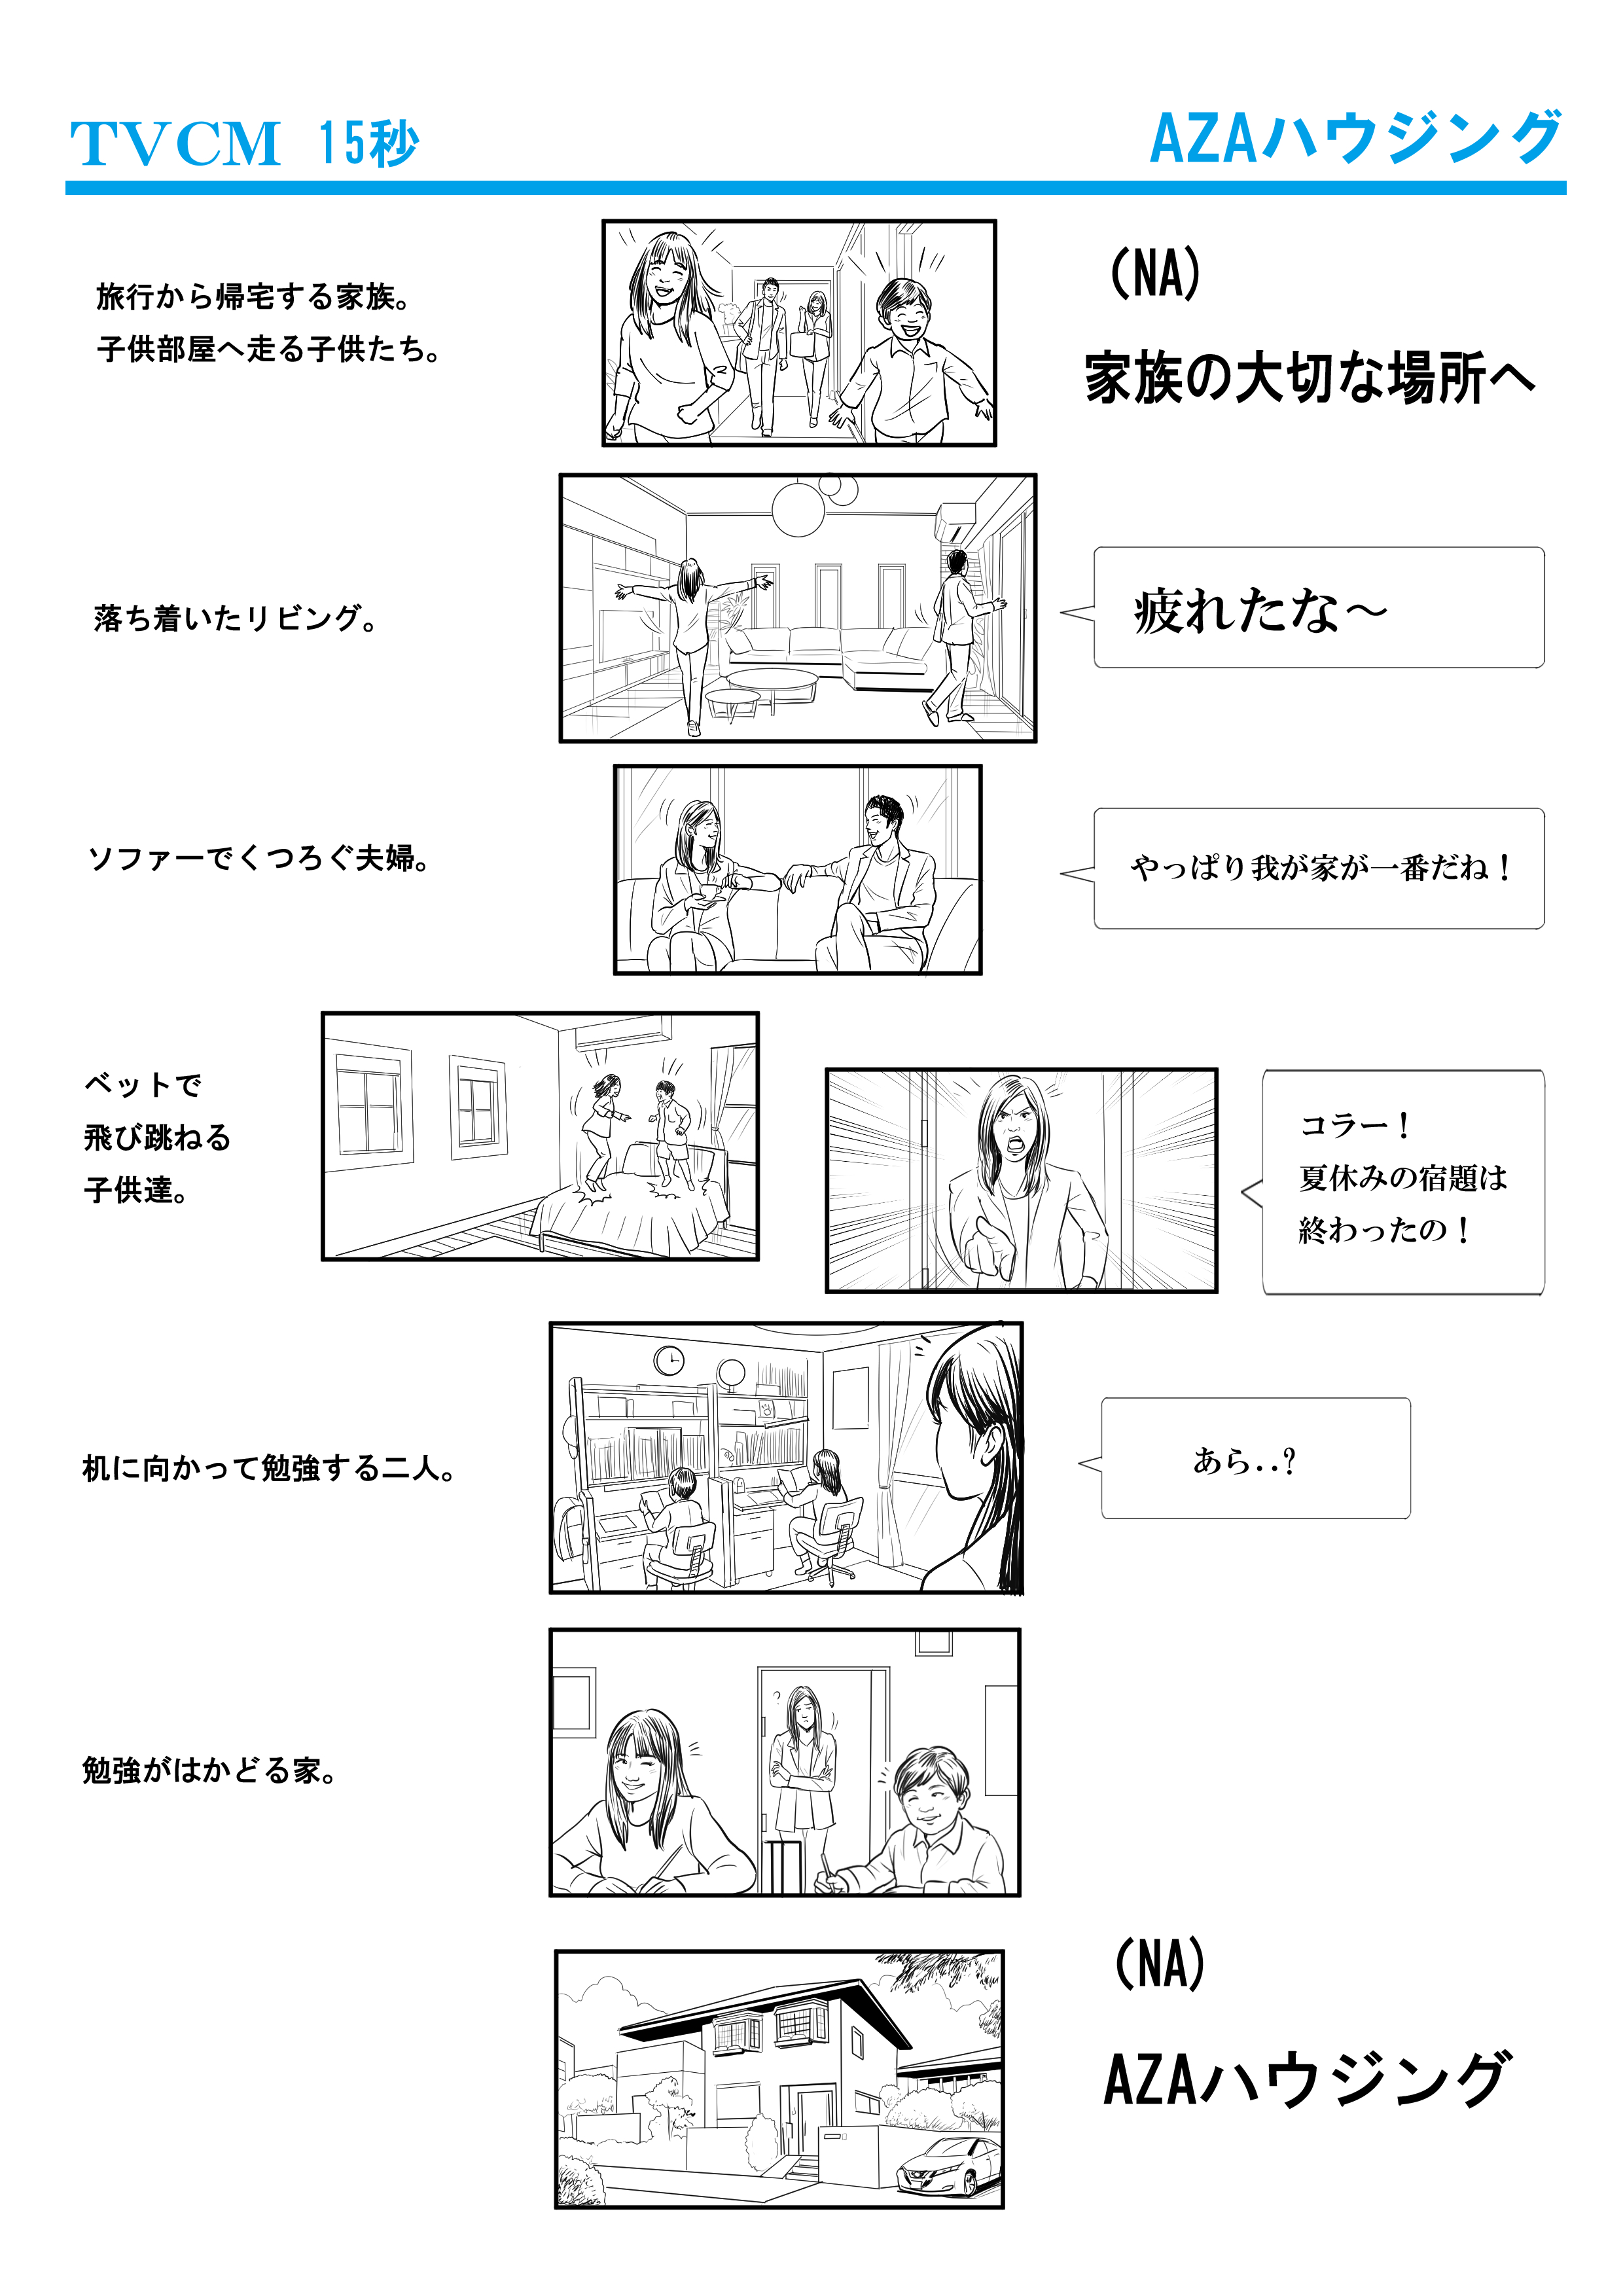 AZADESIGN絵コンテサンプル